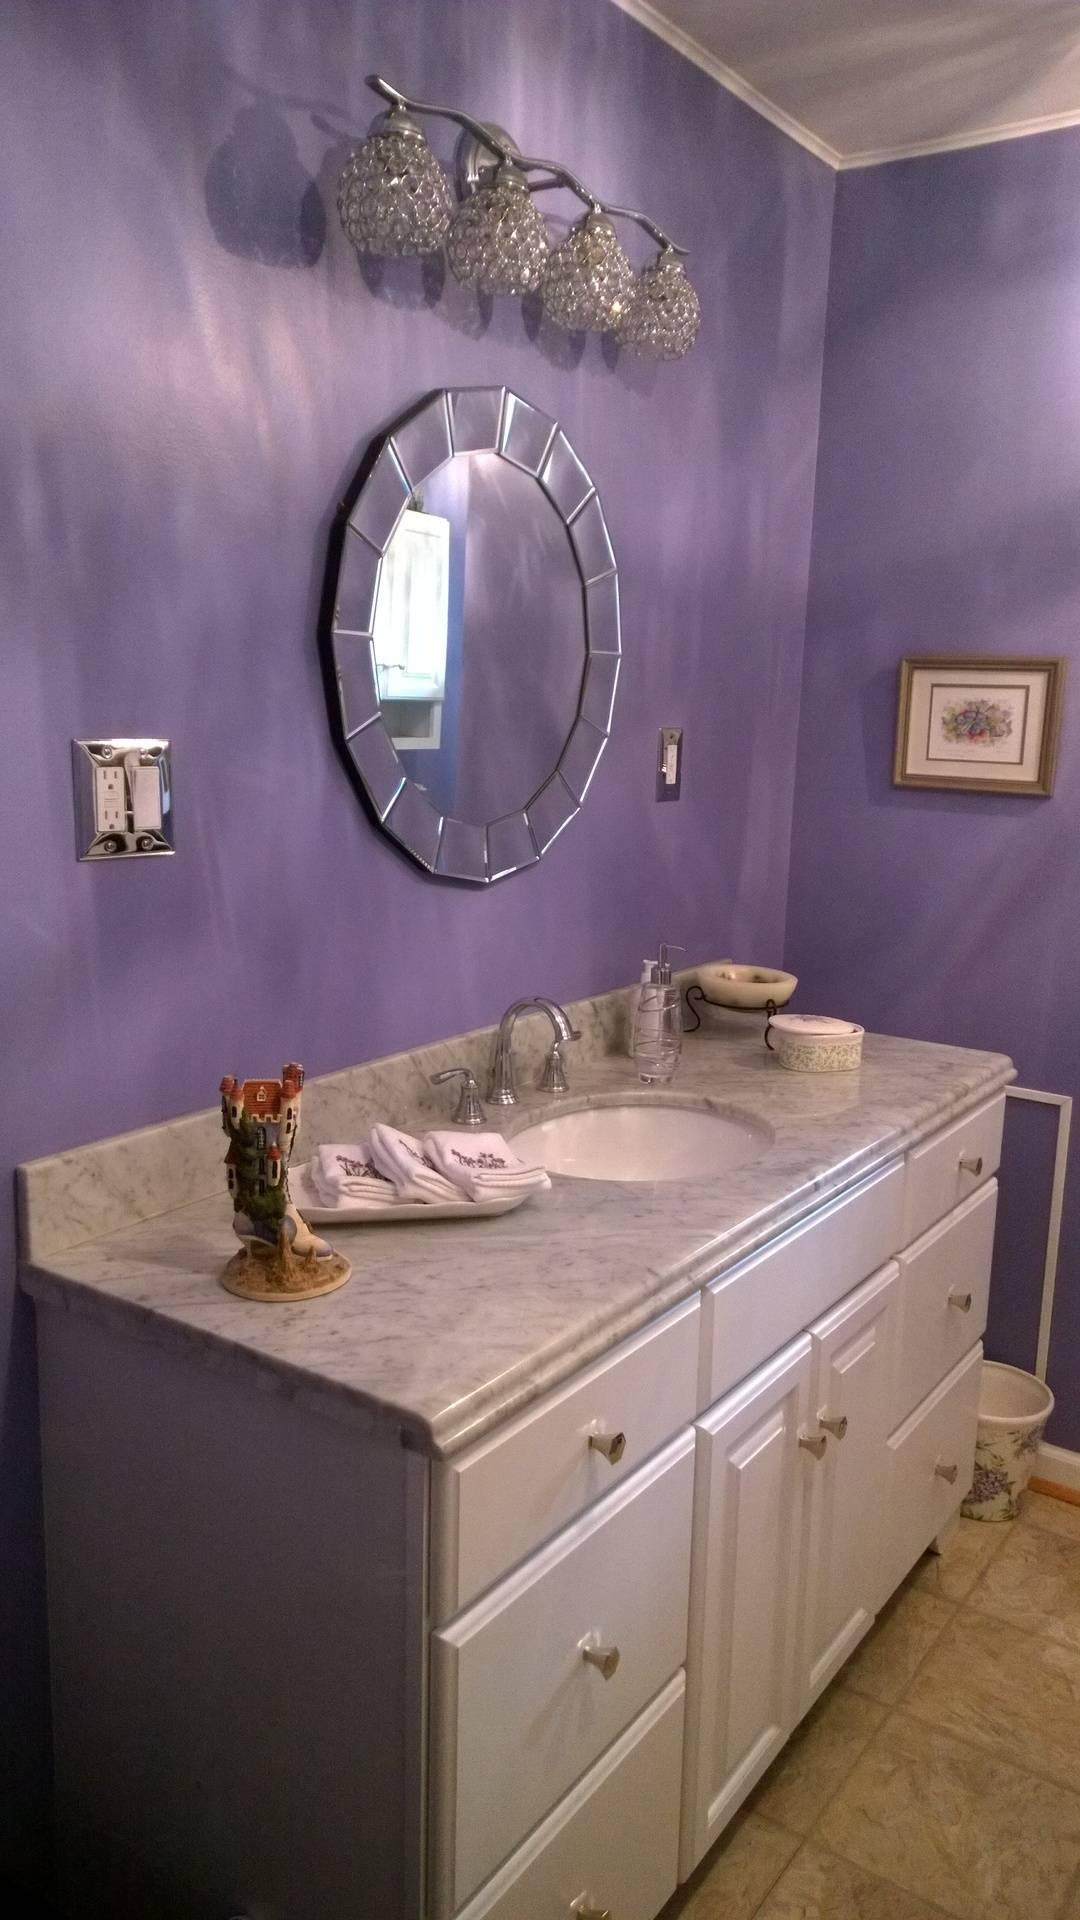 Completed vanity